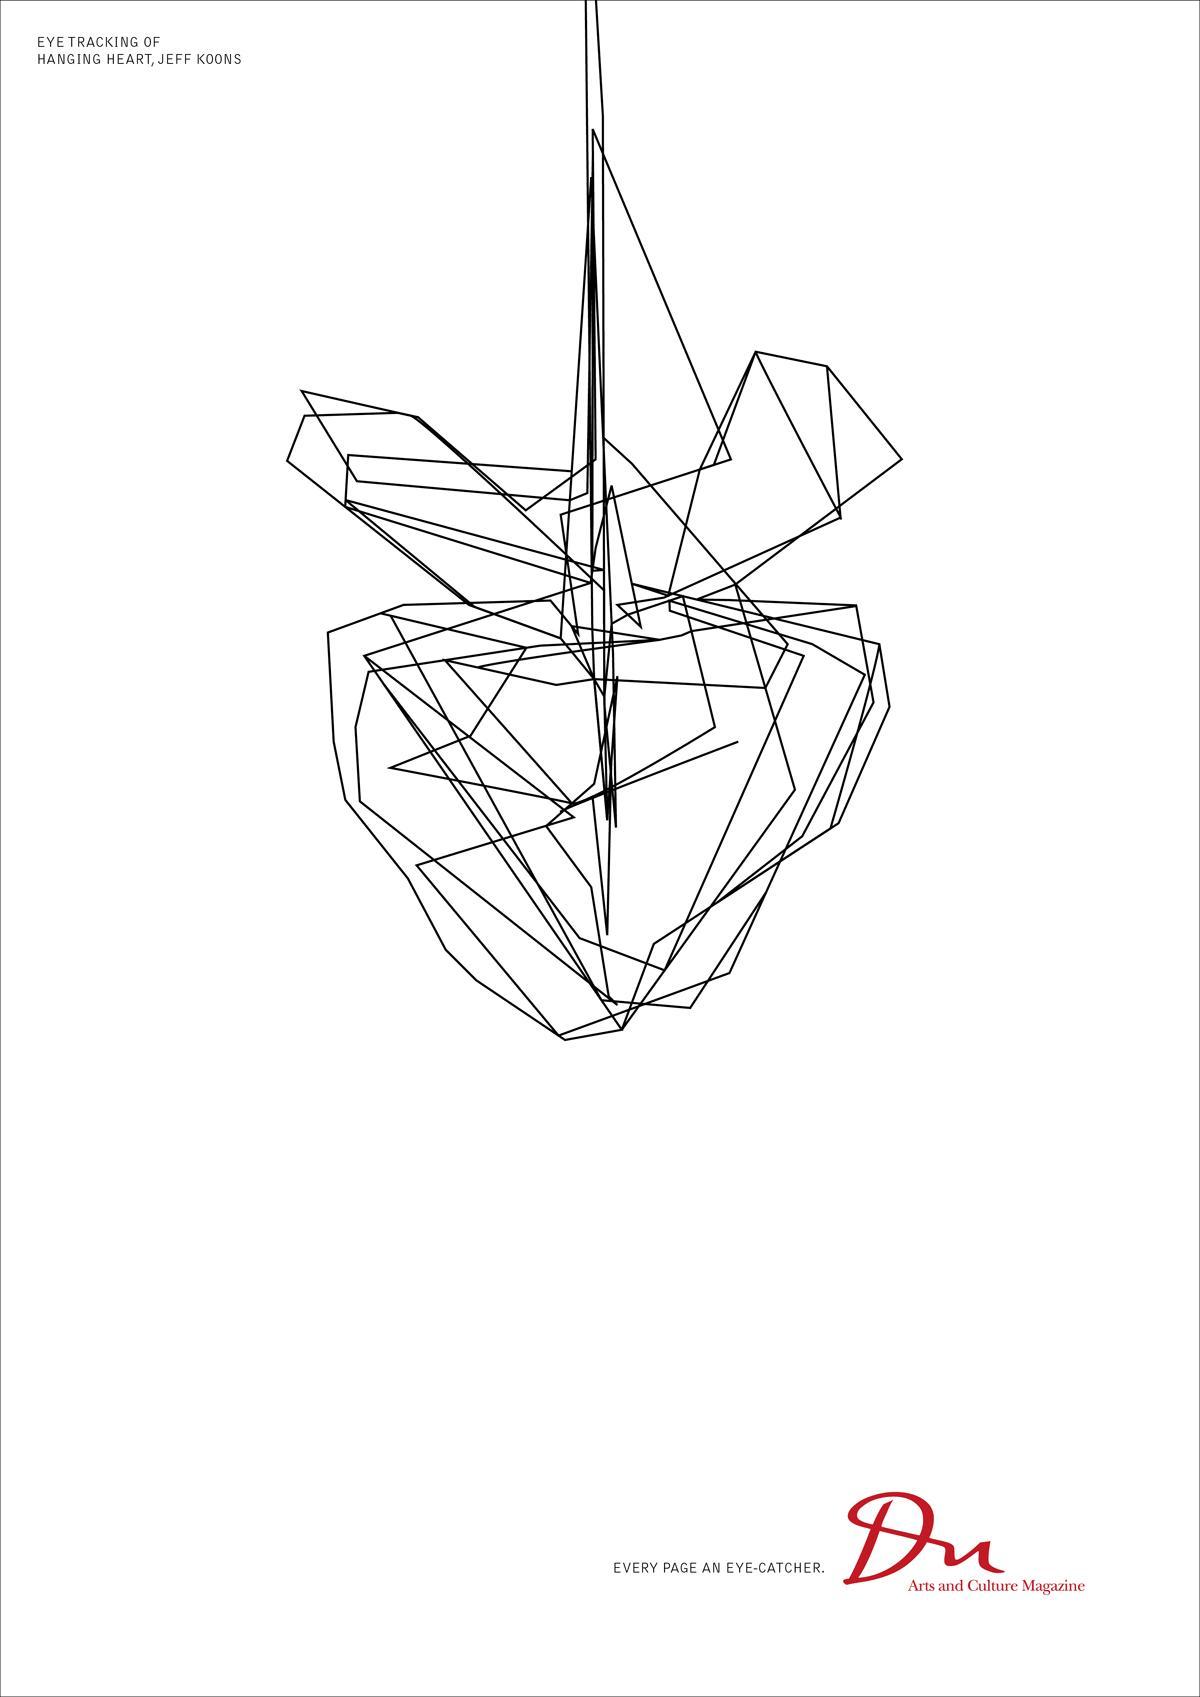 DU Kulturmagazin Print Ad -  Eye tracking Jeff Koons